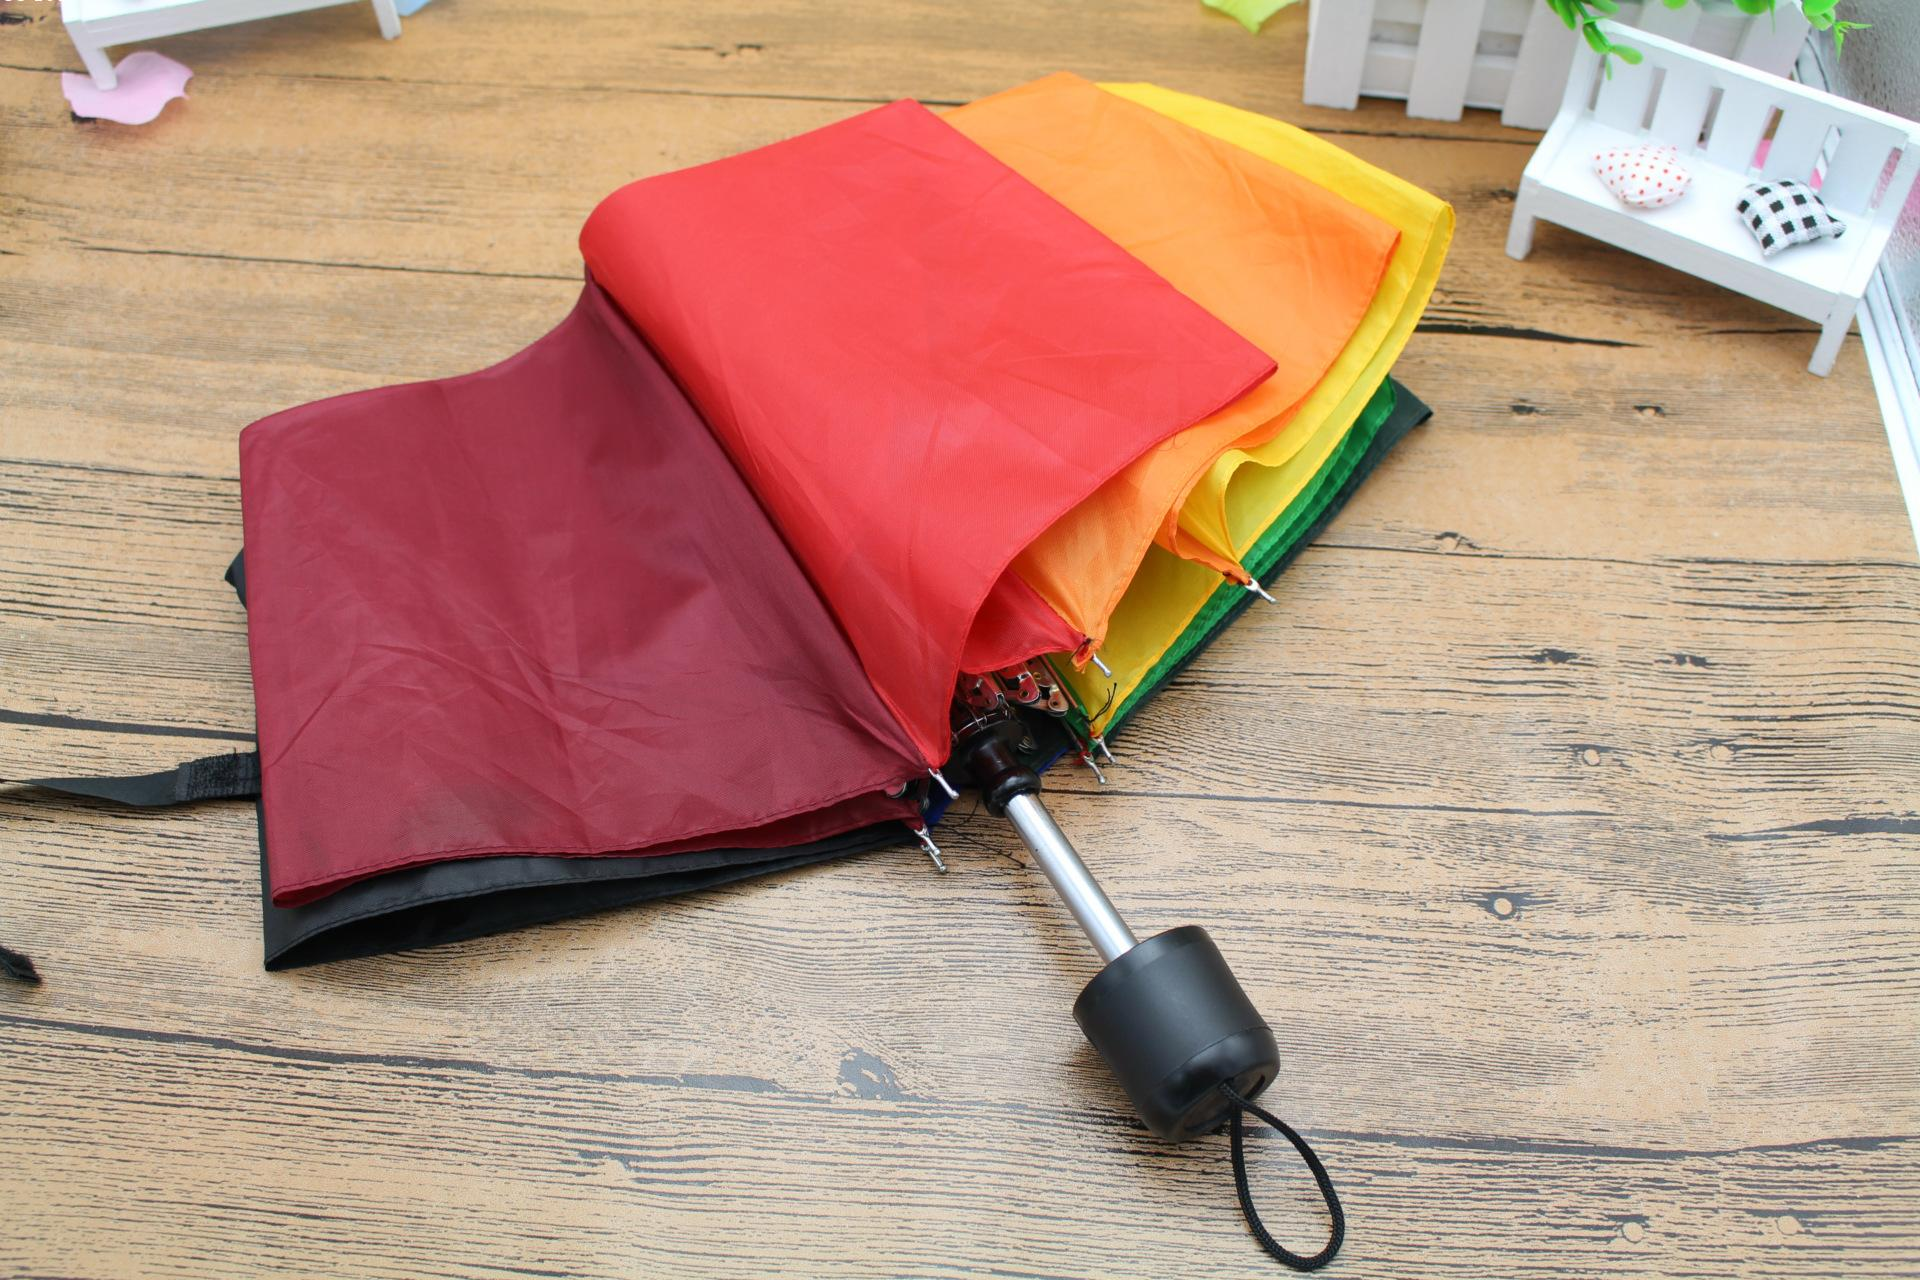 Fashion-Parasol-Rainbow-Umbrella-Handle-Straight-Colorful-Umbrella-Female-Sunny-And-Rainy-Umbrella Unique De Promo Parasol Schème